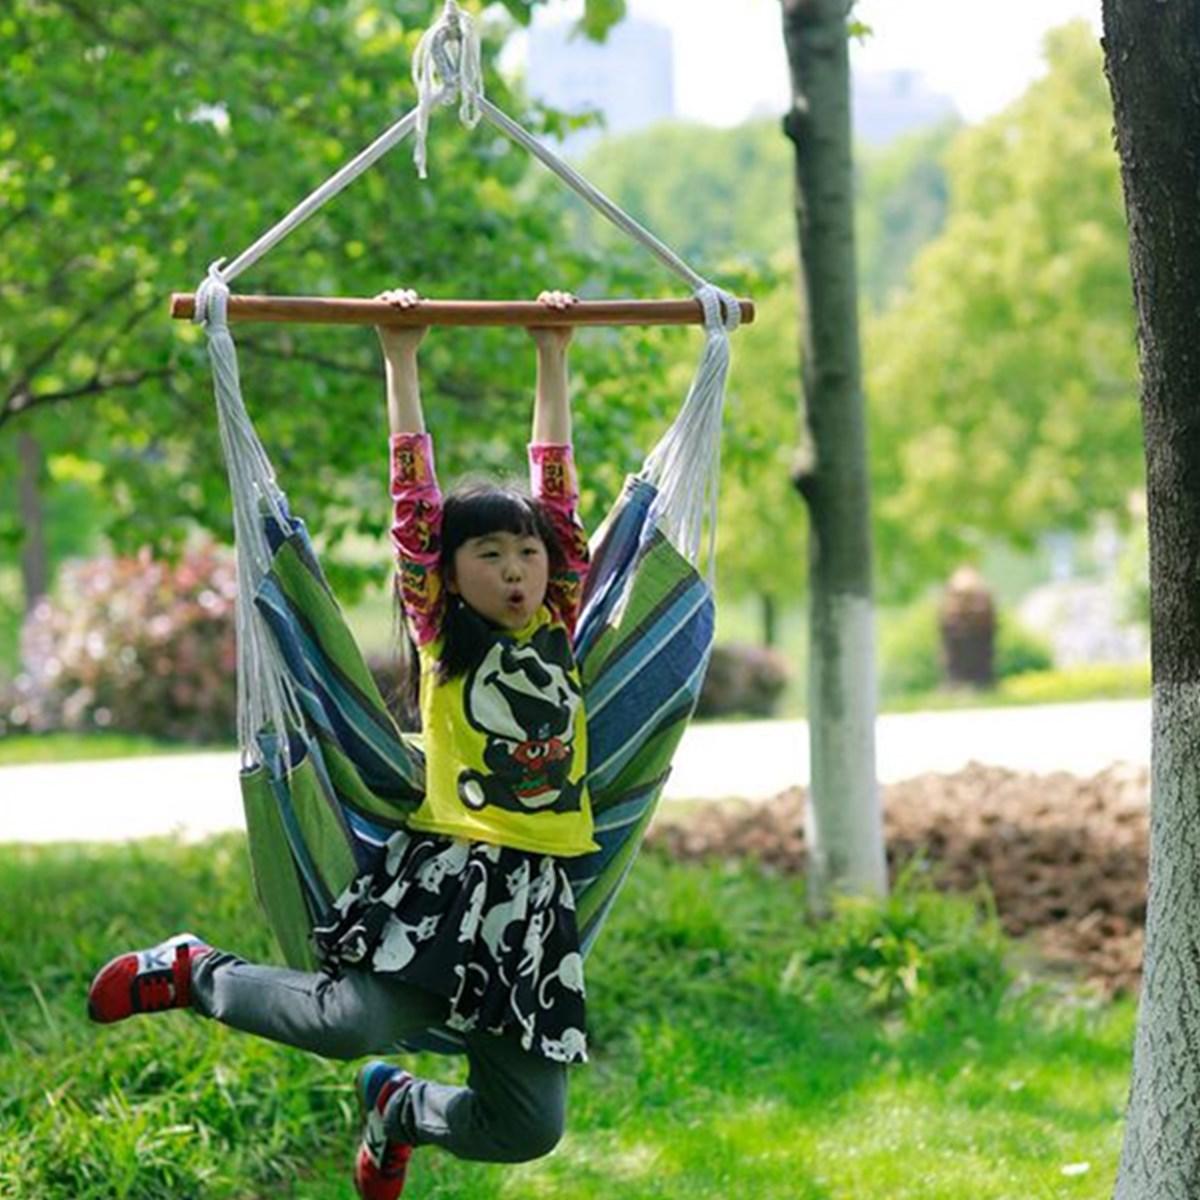 Outdoor Canvas Hammock Chair Swing Hanging Chair Relax Soft Indoor Garden Camping Swing